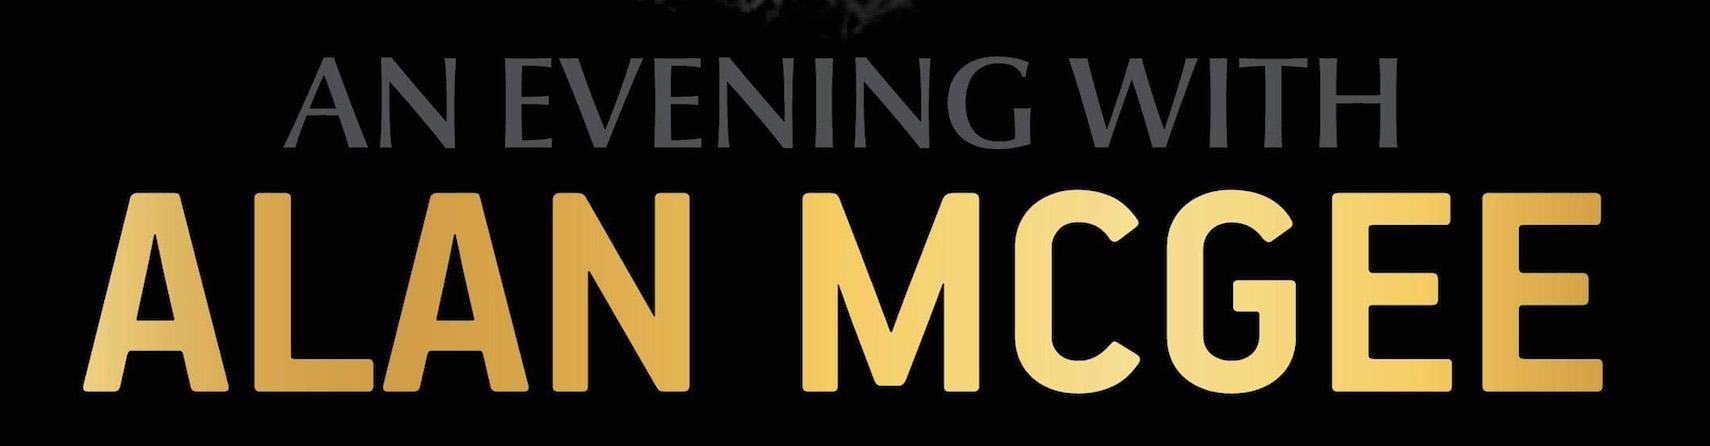 alan mcgee logo